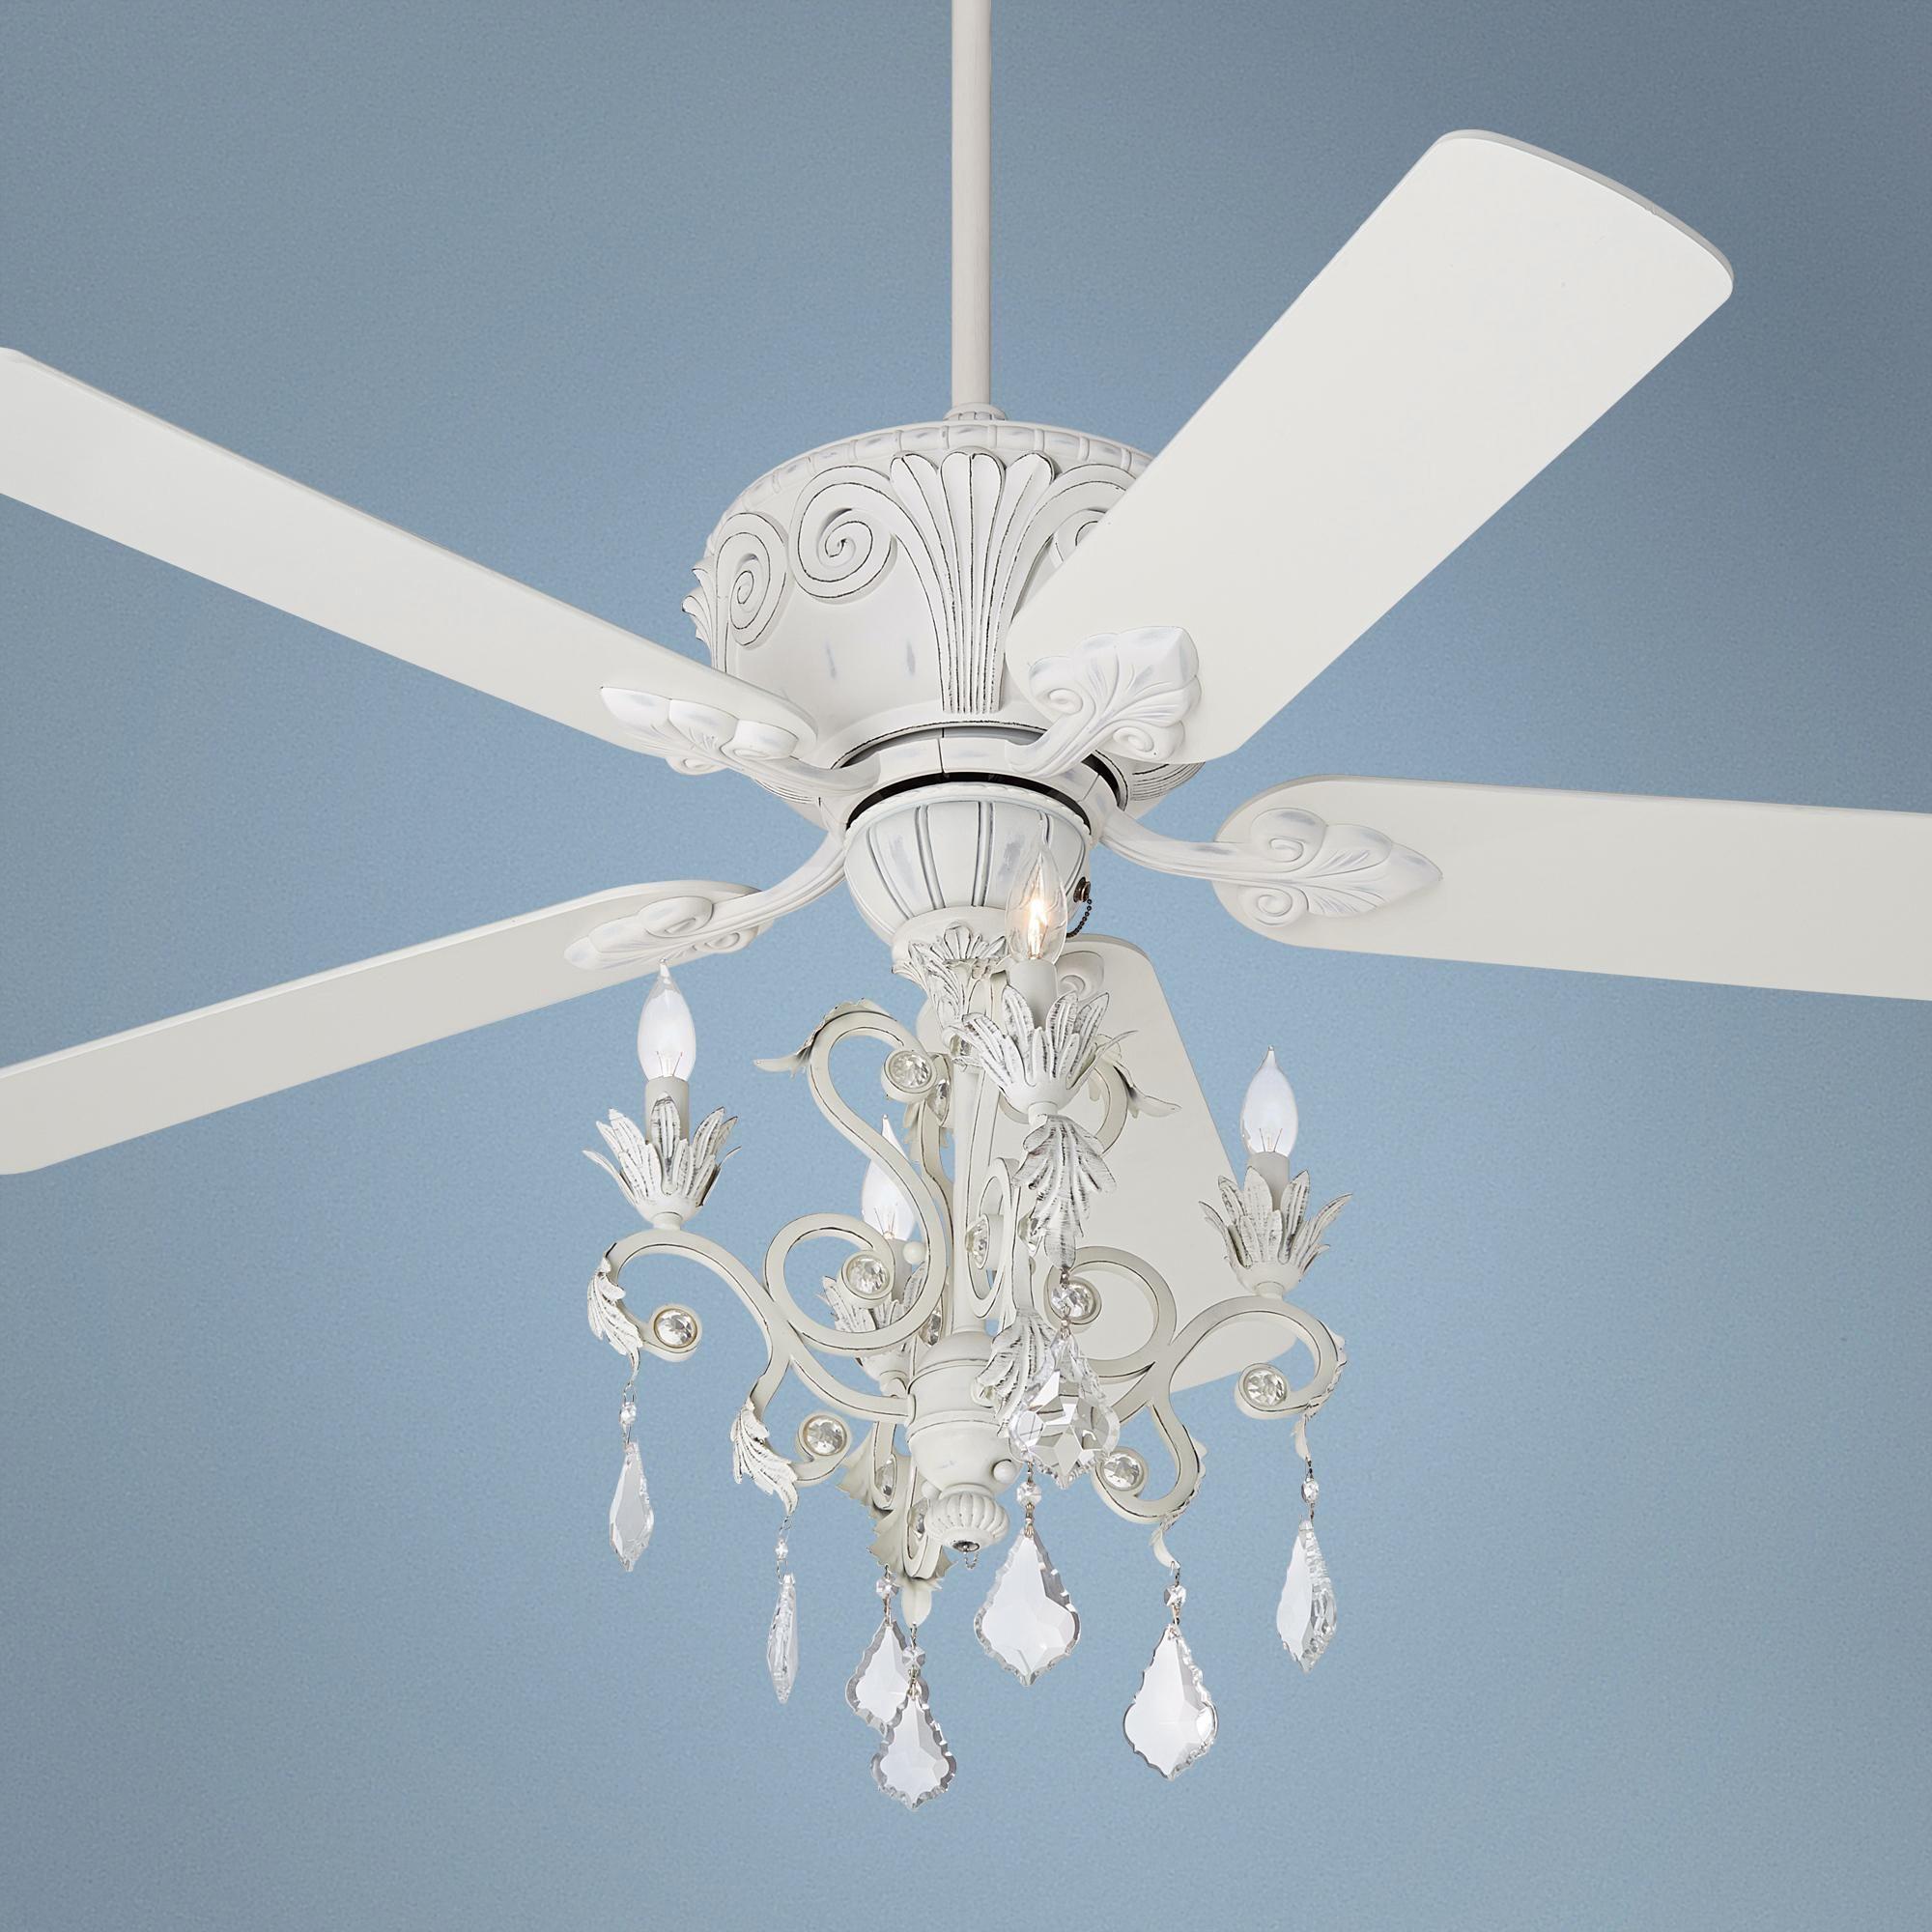 casa deville rubbed white chandelier ceiling fan master bedroom ceiling fan chandelier. Black Bedroom Furniture Sets. Home Design Ideas